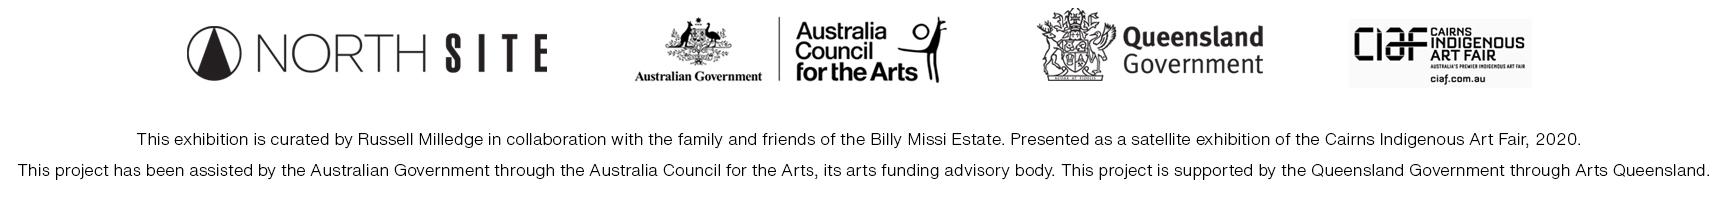 Australia Council Arts Queensland logos